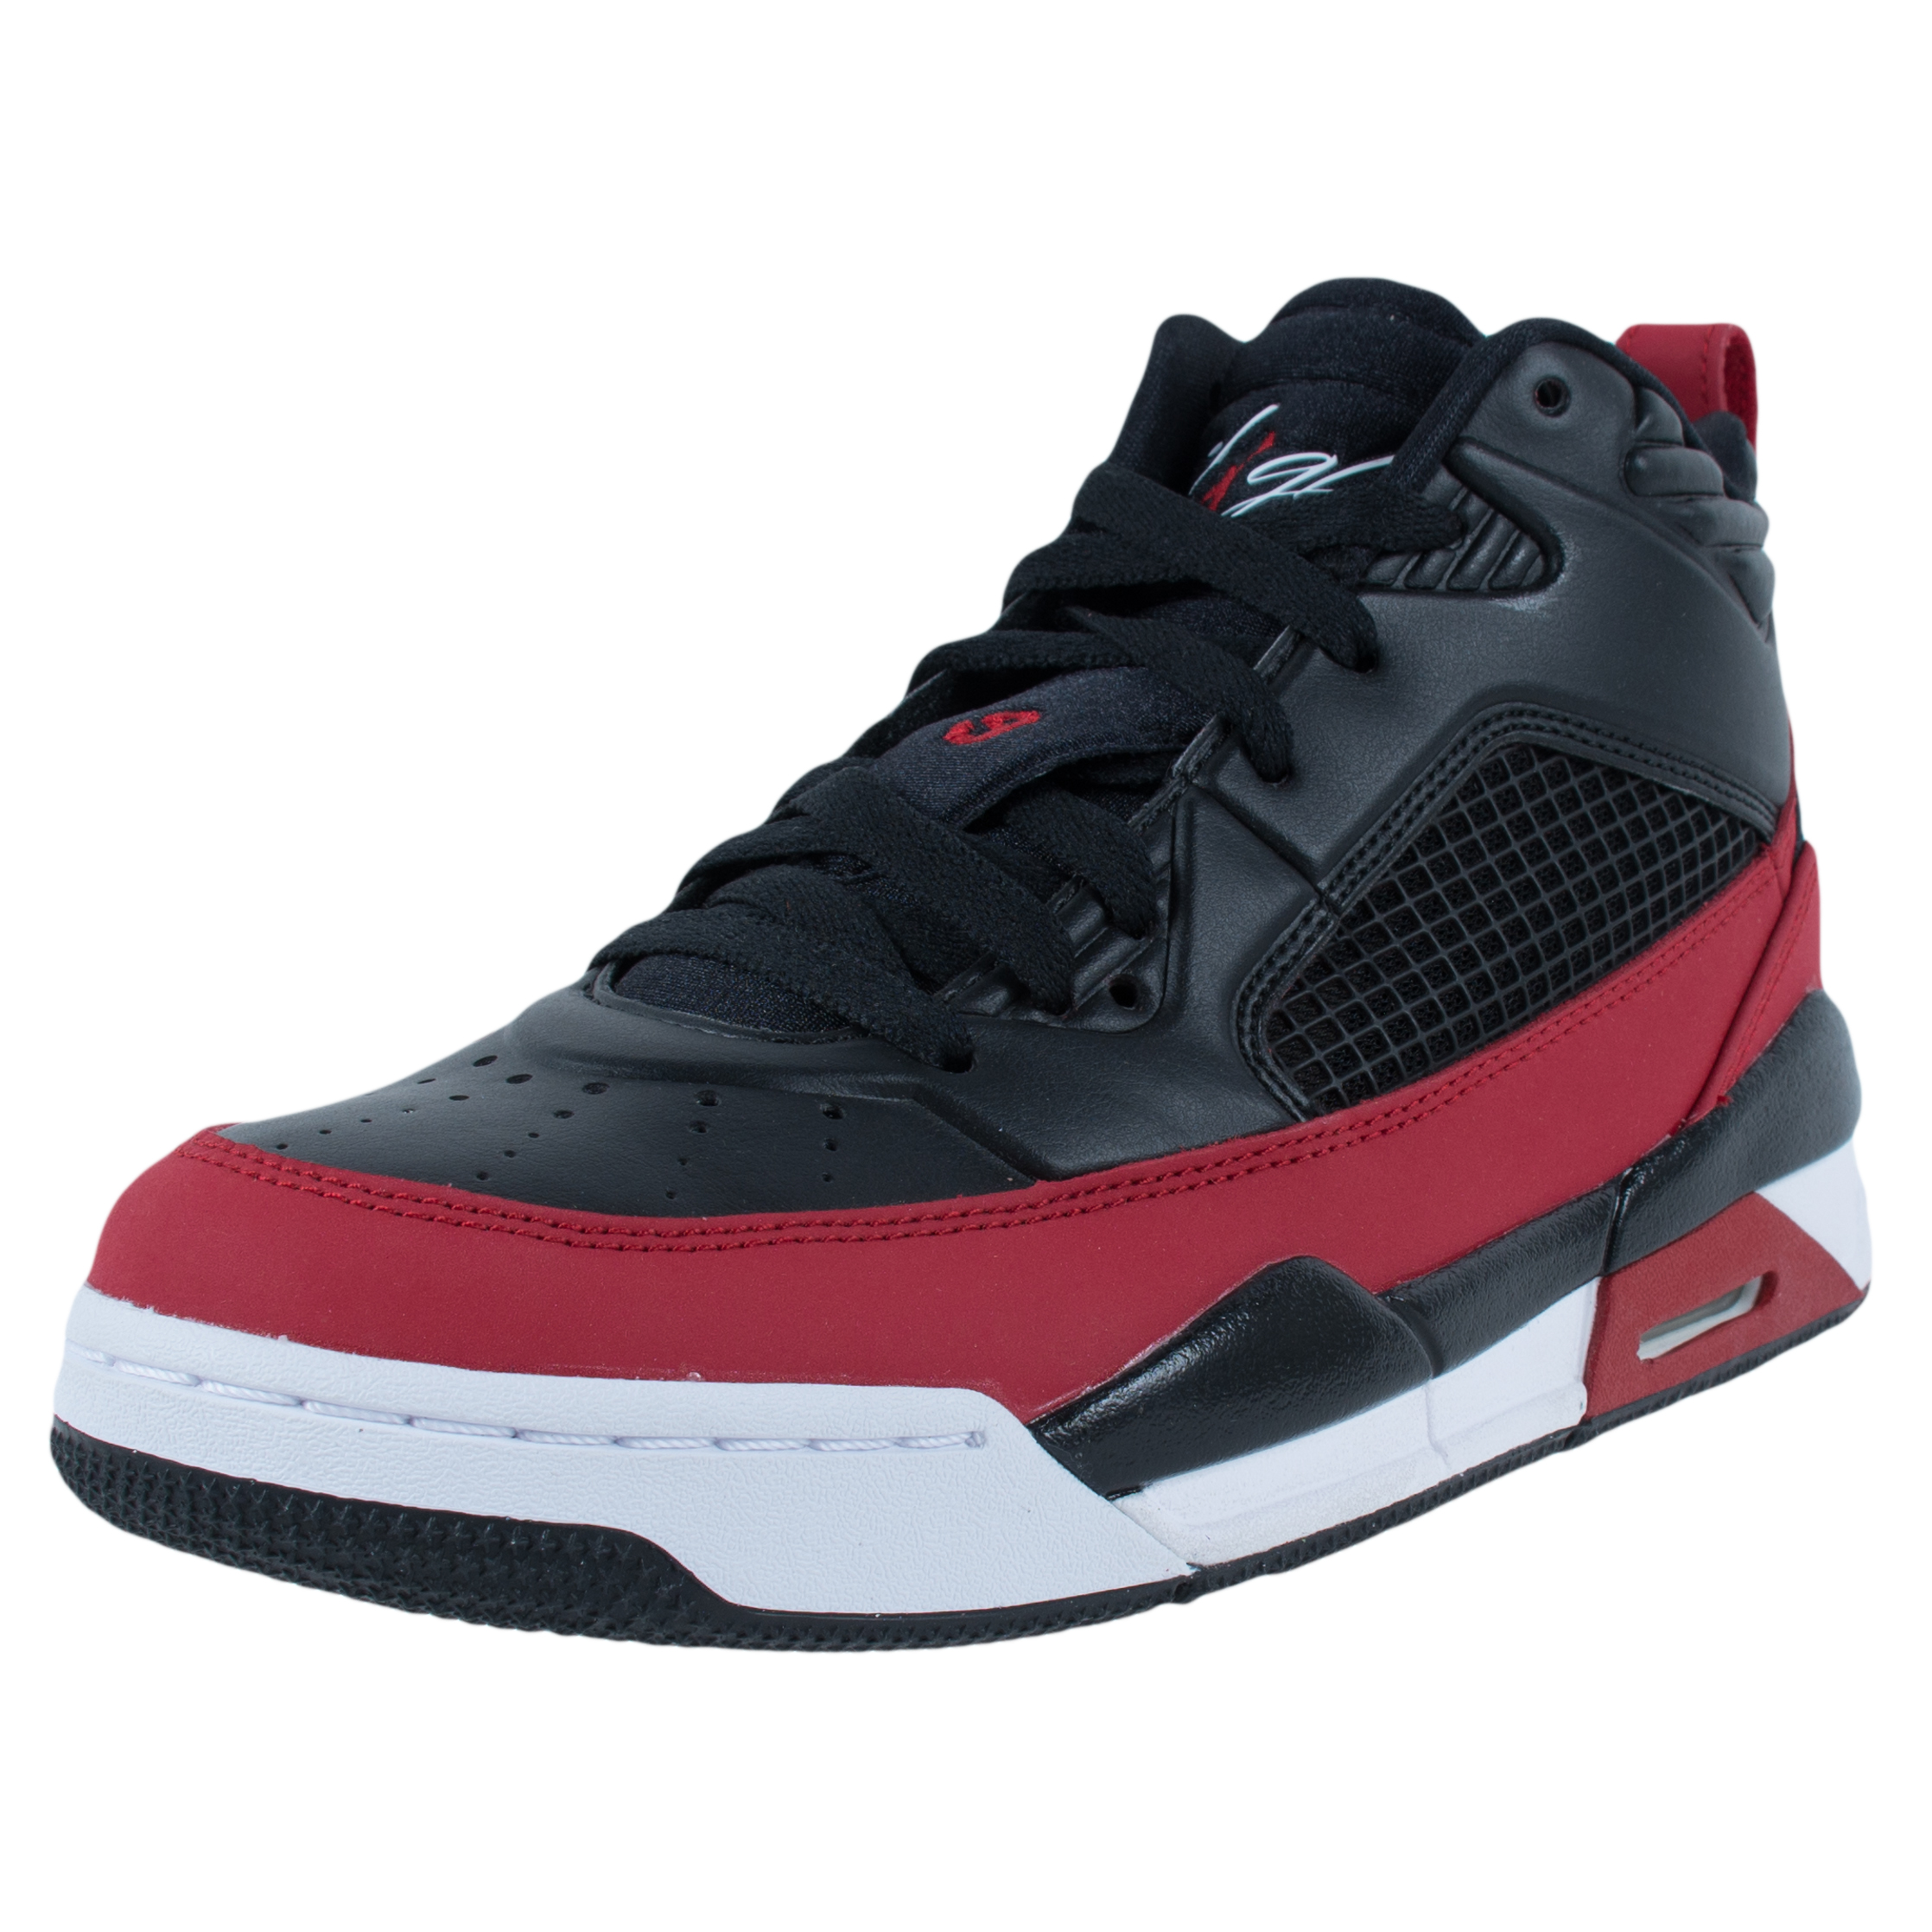 NIKE BOYS JORDAN FLIGHT 9.5 BG BASKETBALL SHOES BLACK GYM RED WHITE 654975  002